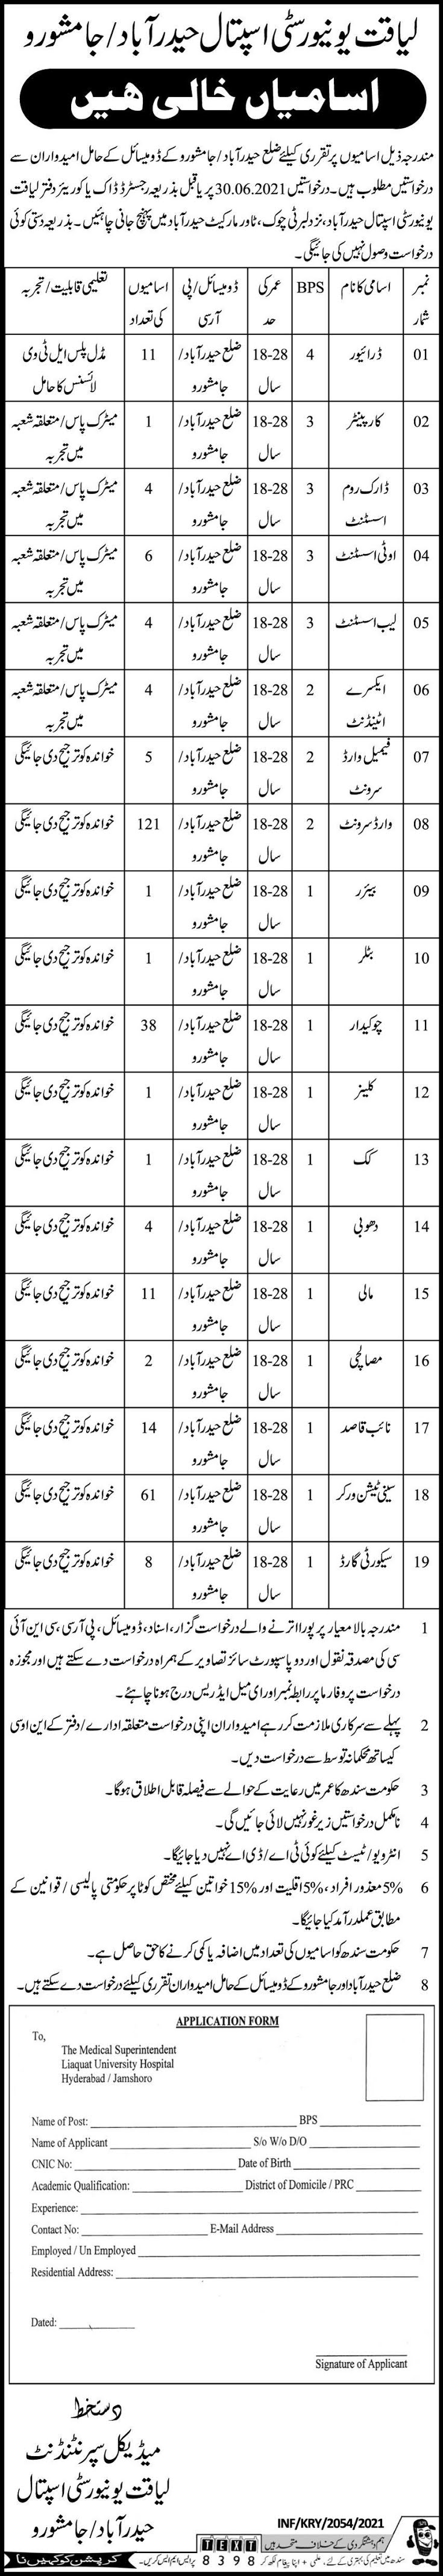 Liaquat University Hospital Jobs 2021 in Pakistan